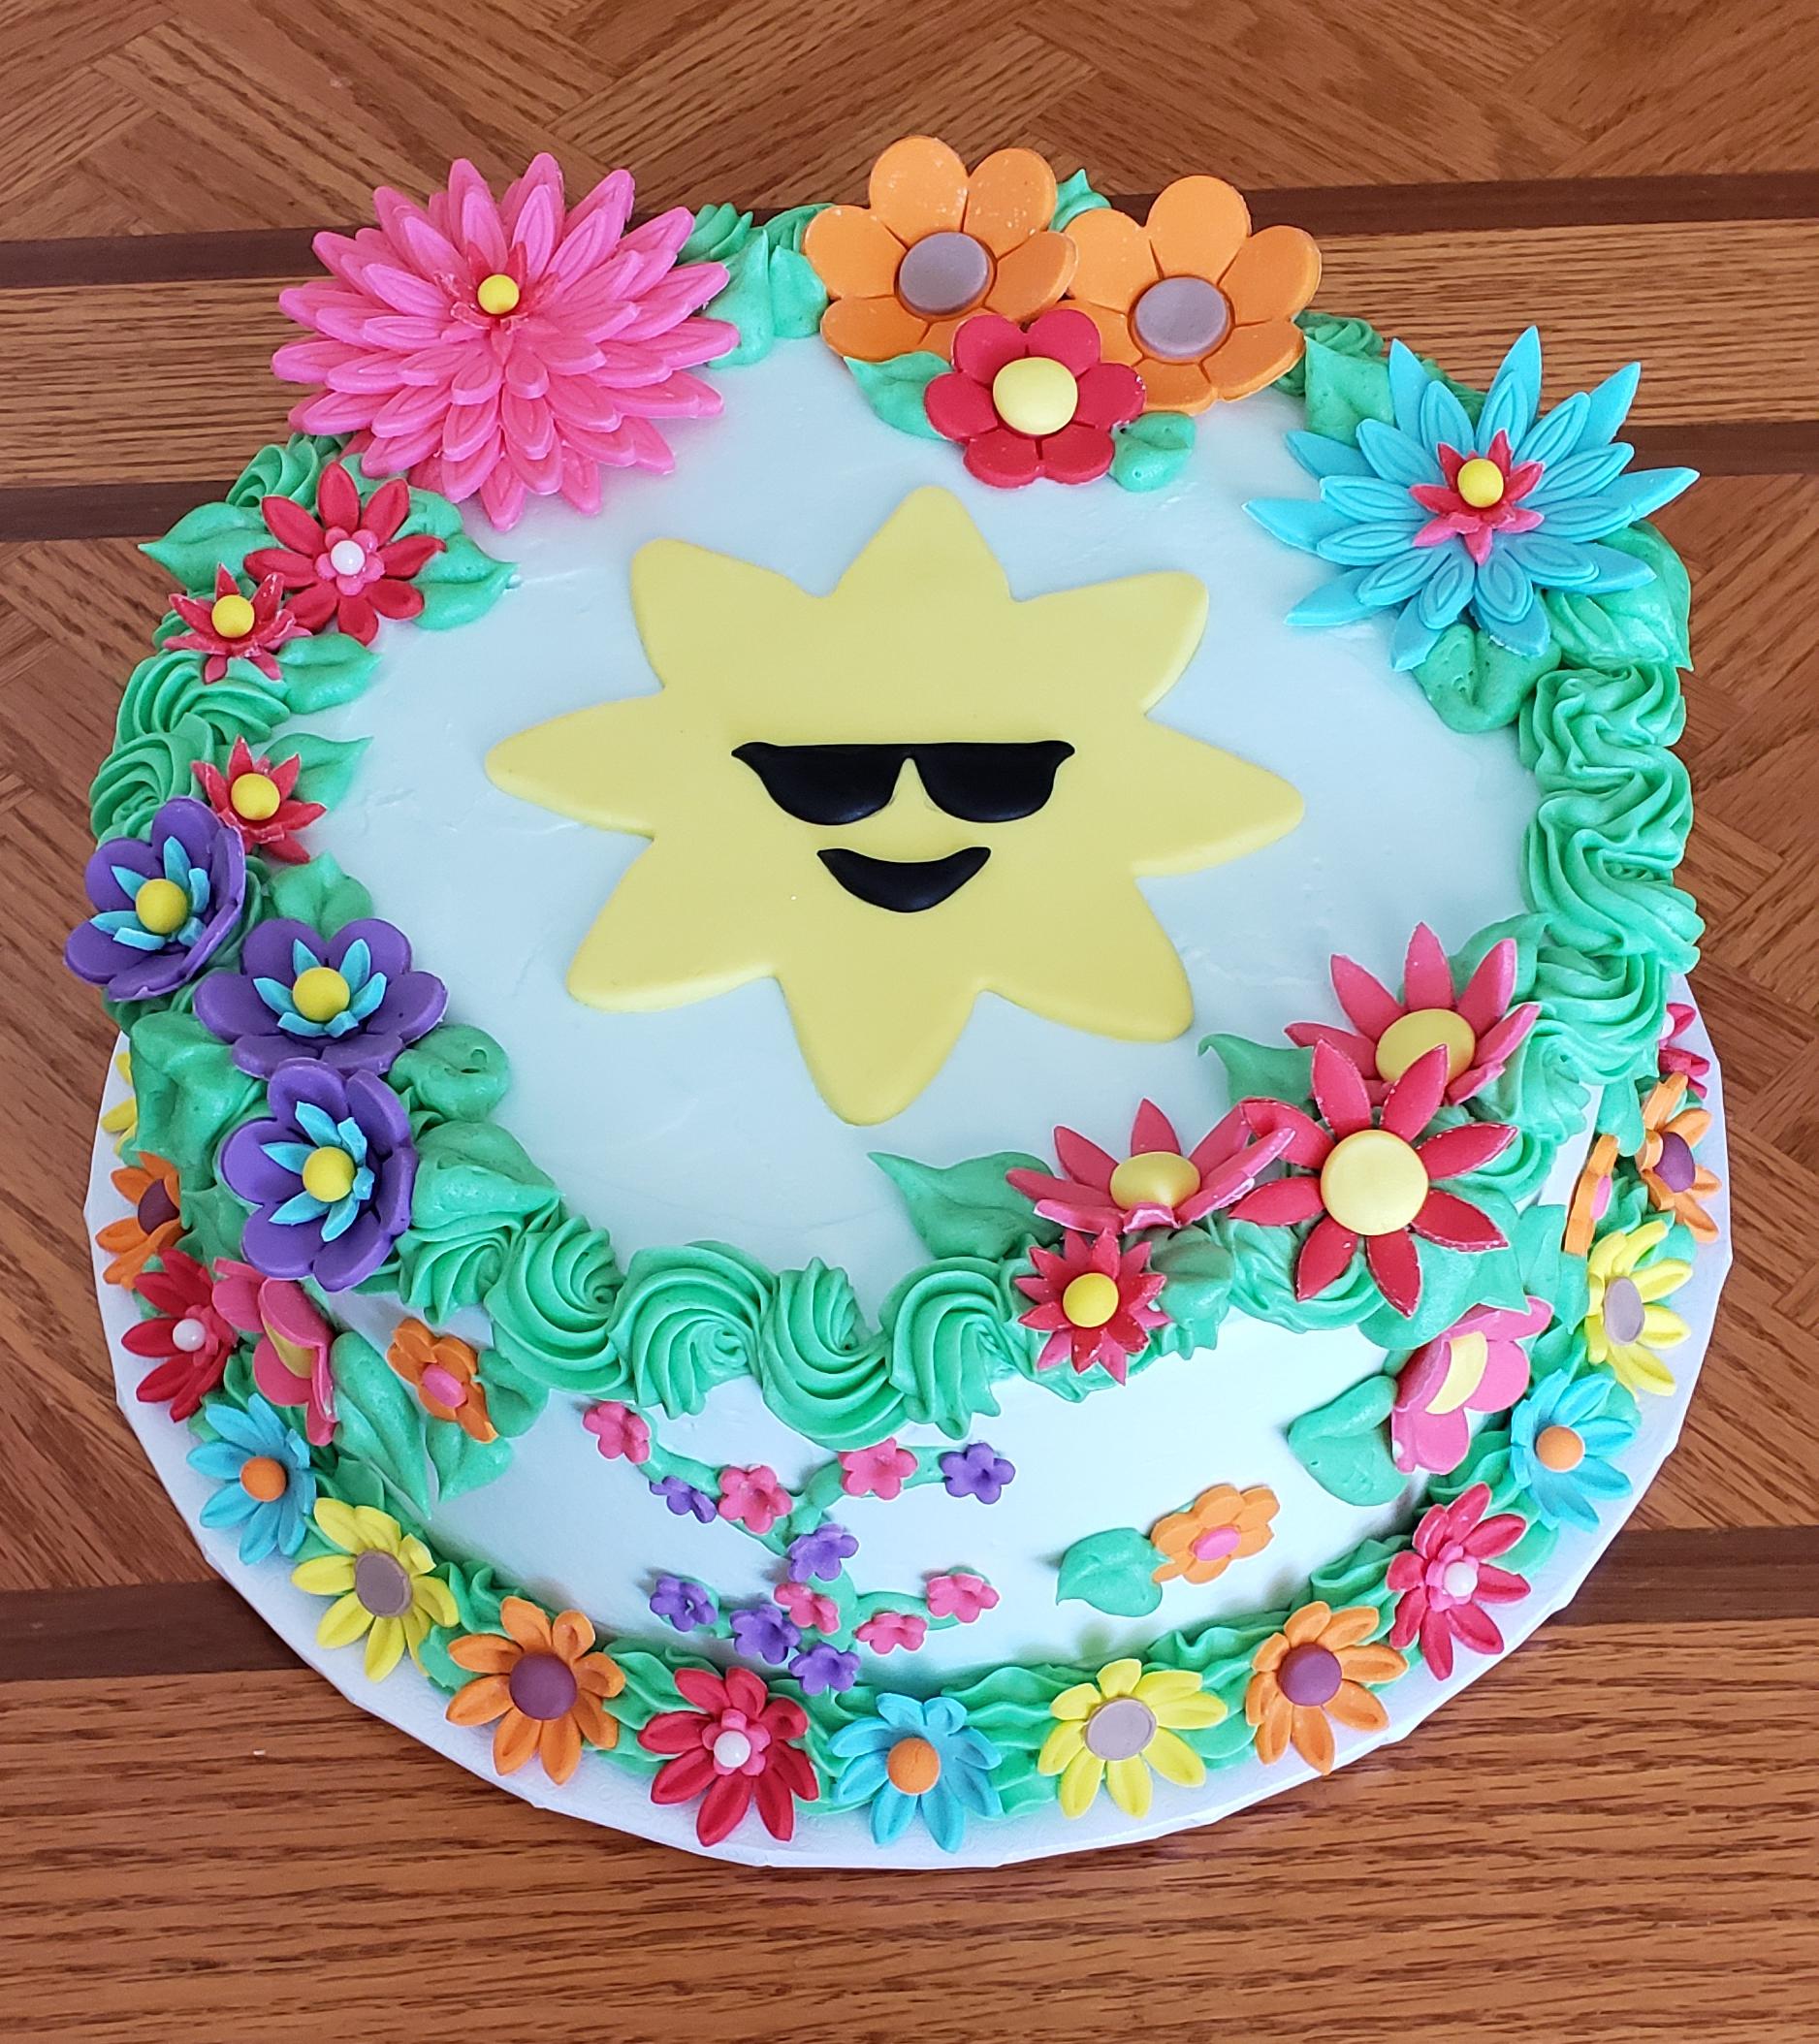 Sunshine and flowers.jpg